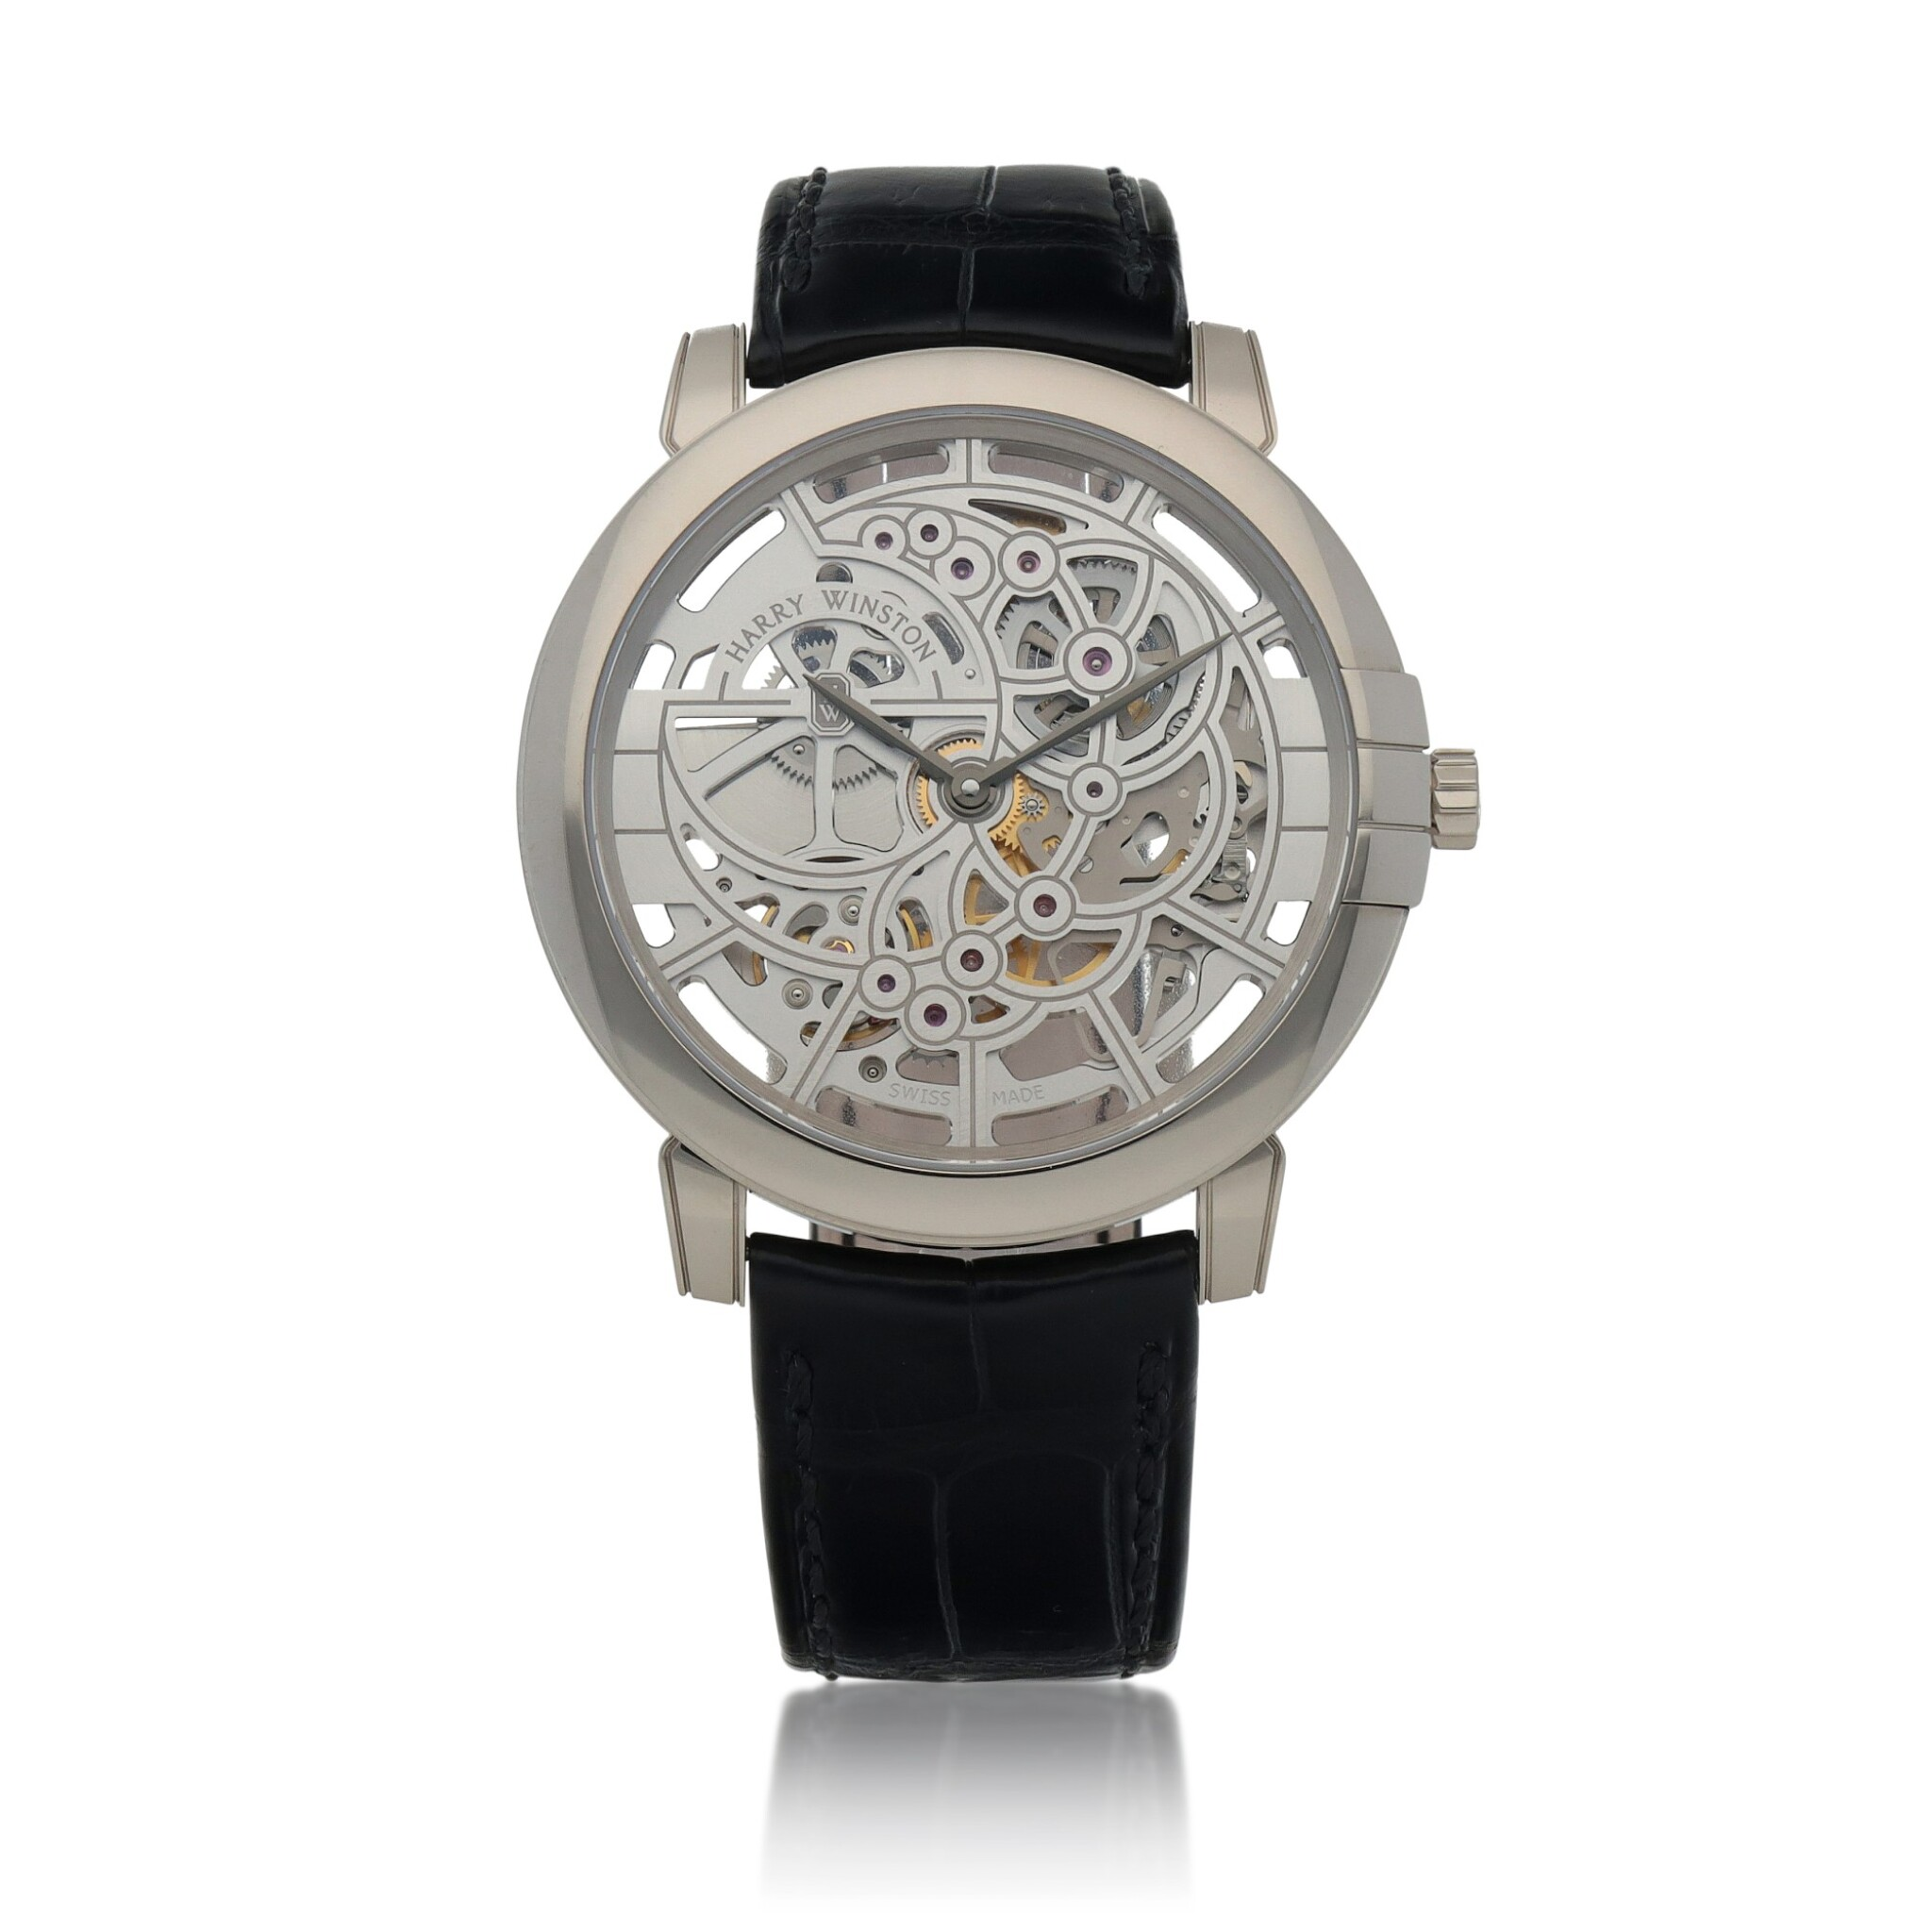 View full screen - View 1 of Lot 540. Midnight, Ref. 450-MAS42W White gold skeletonized wristwatch Circa 2015   海瑞溫斯頓 450-MAS42W型號「Midnight」白金鏤空腕錶,年份約2015.